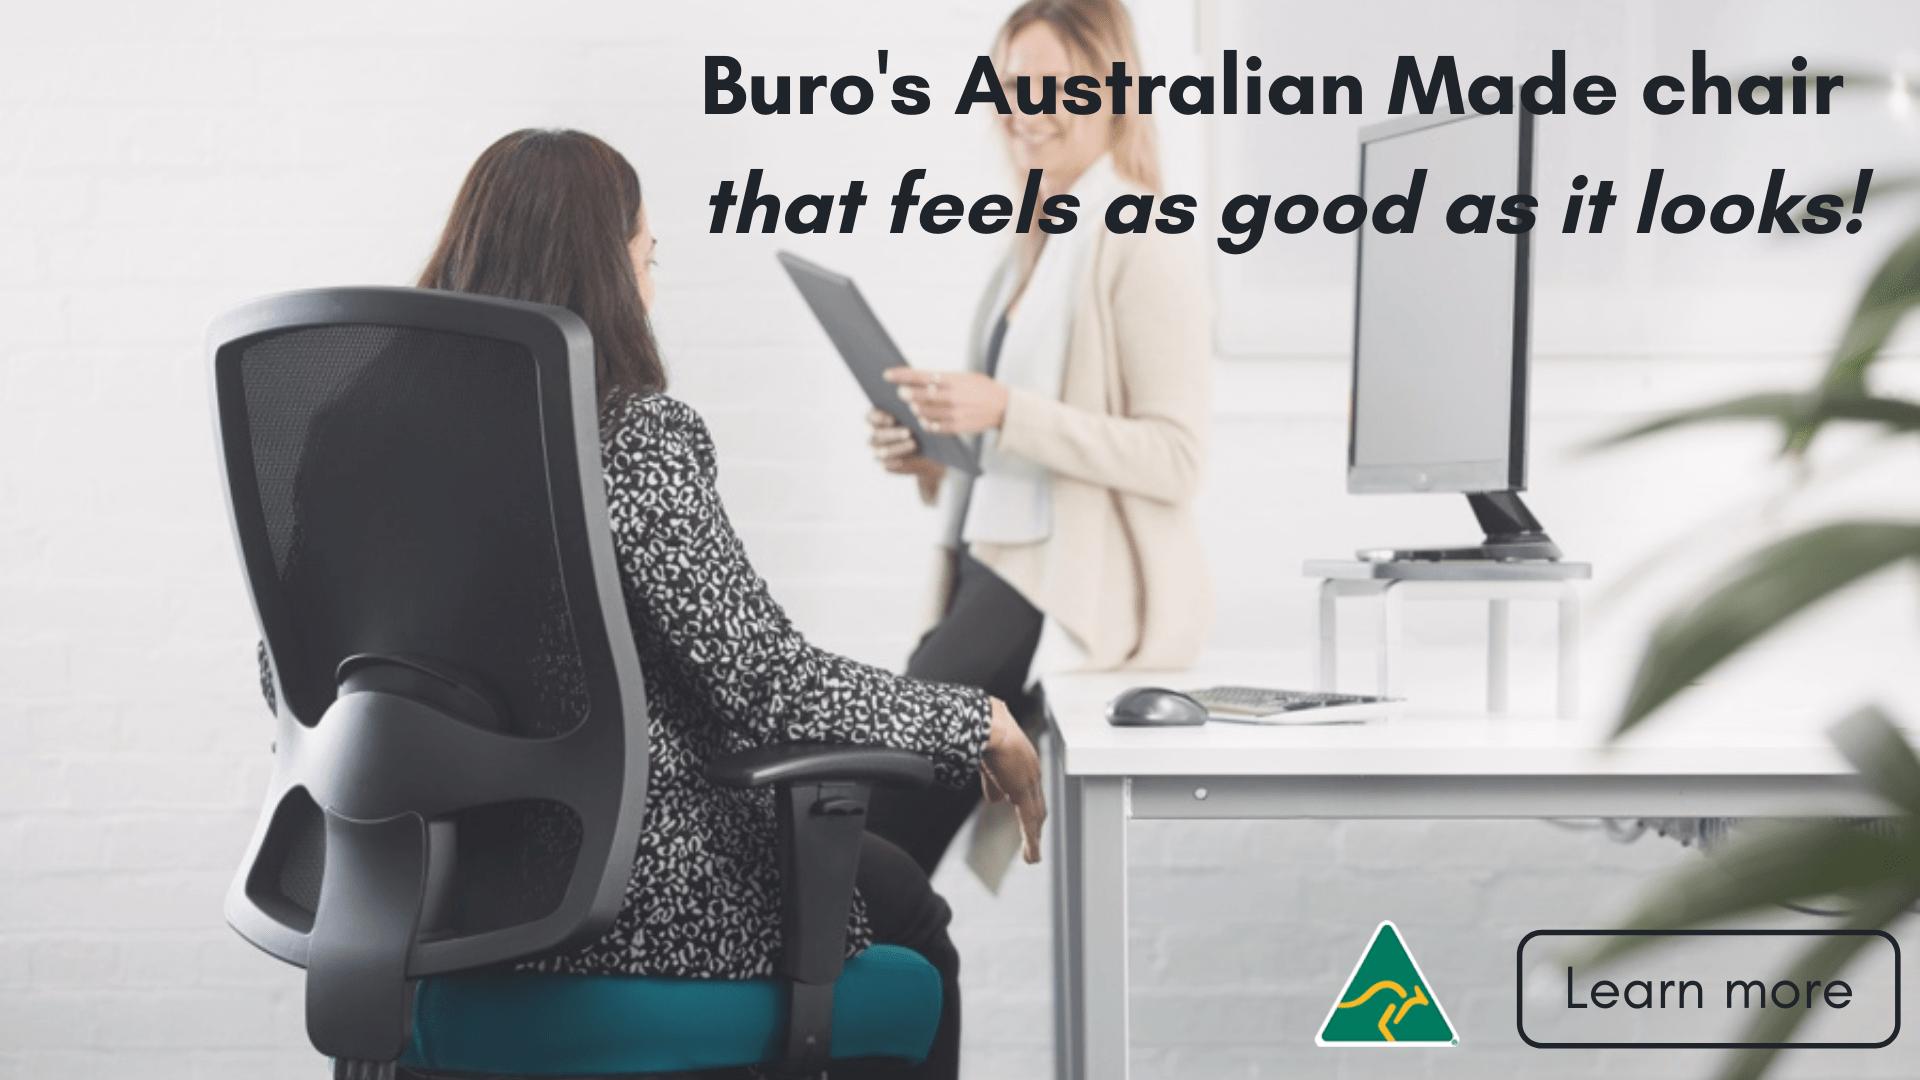 Buro's Australian made chair